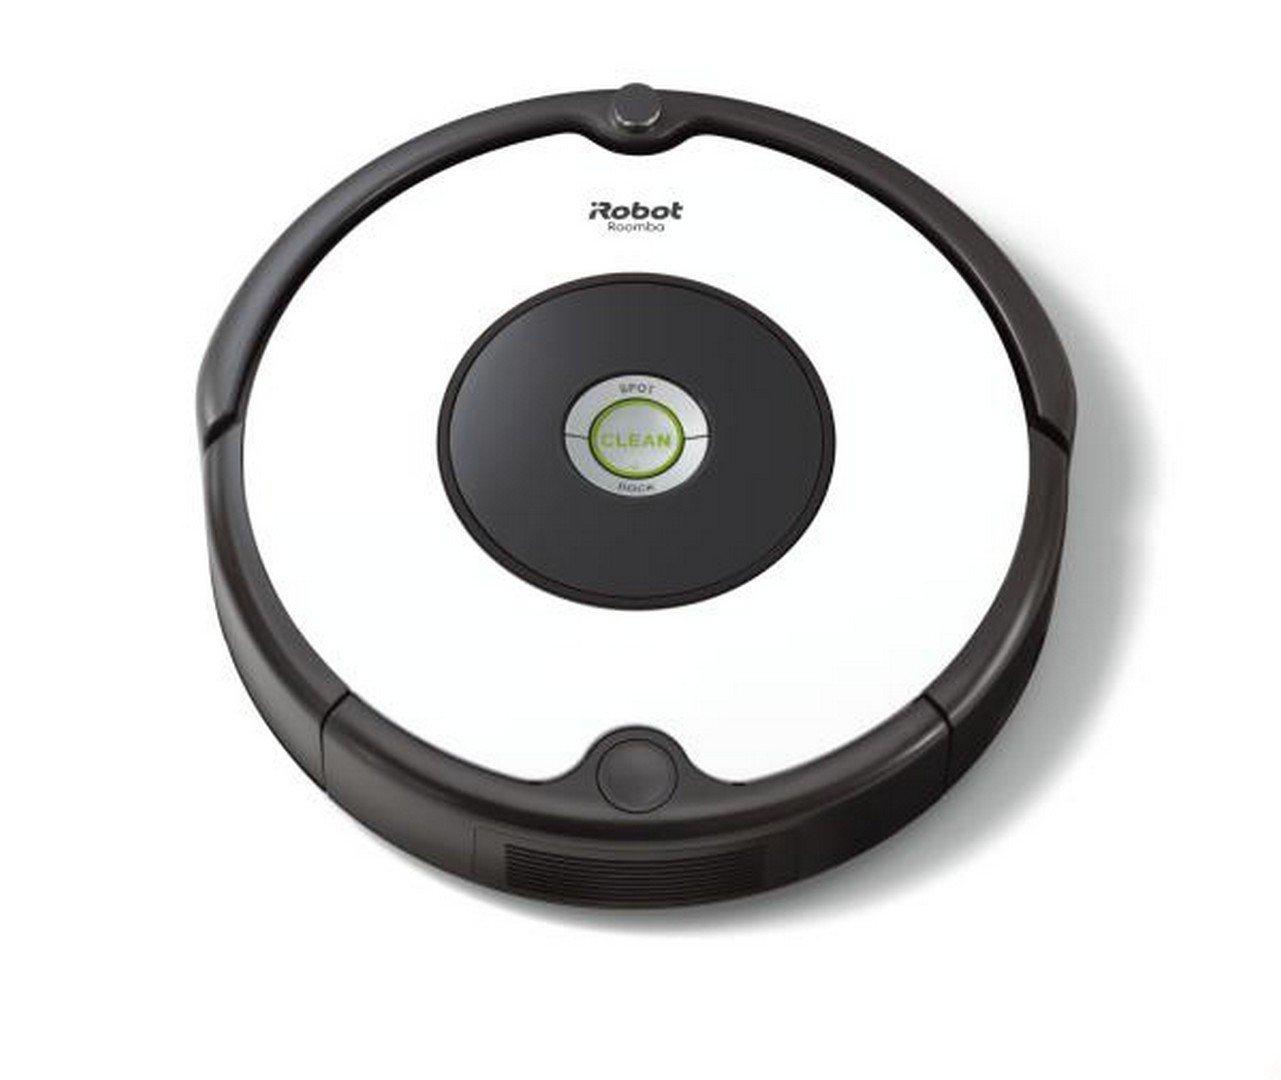 [Metro] iRobot Roomba 605 Staubsaugroboter (15% auf VGP sparen)